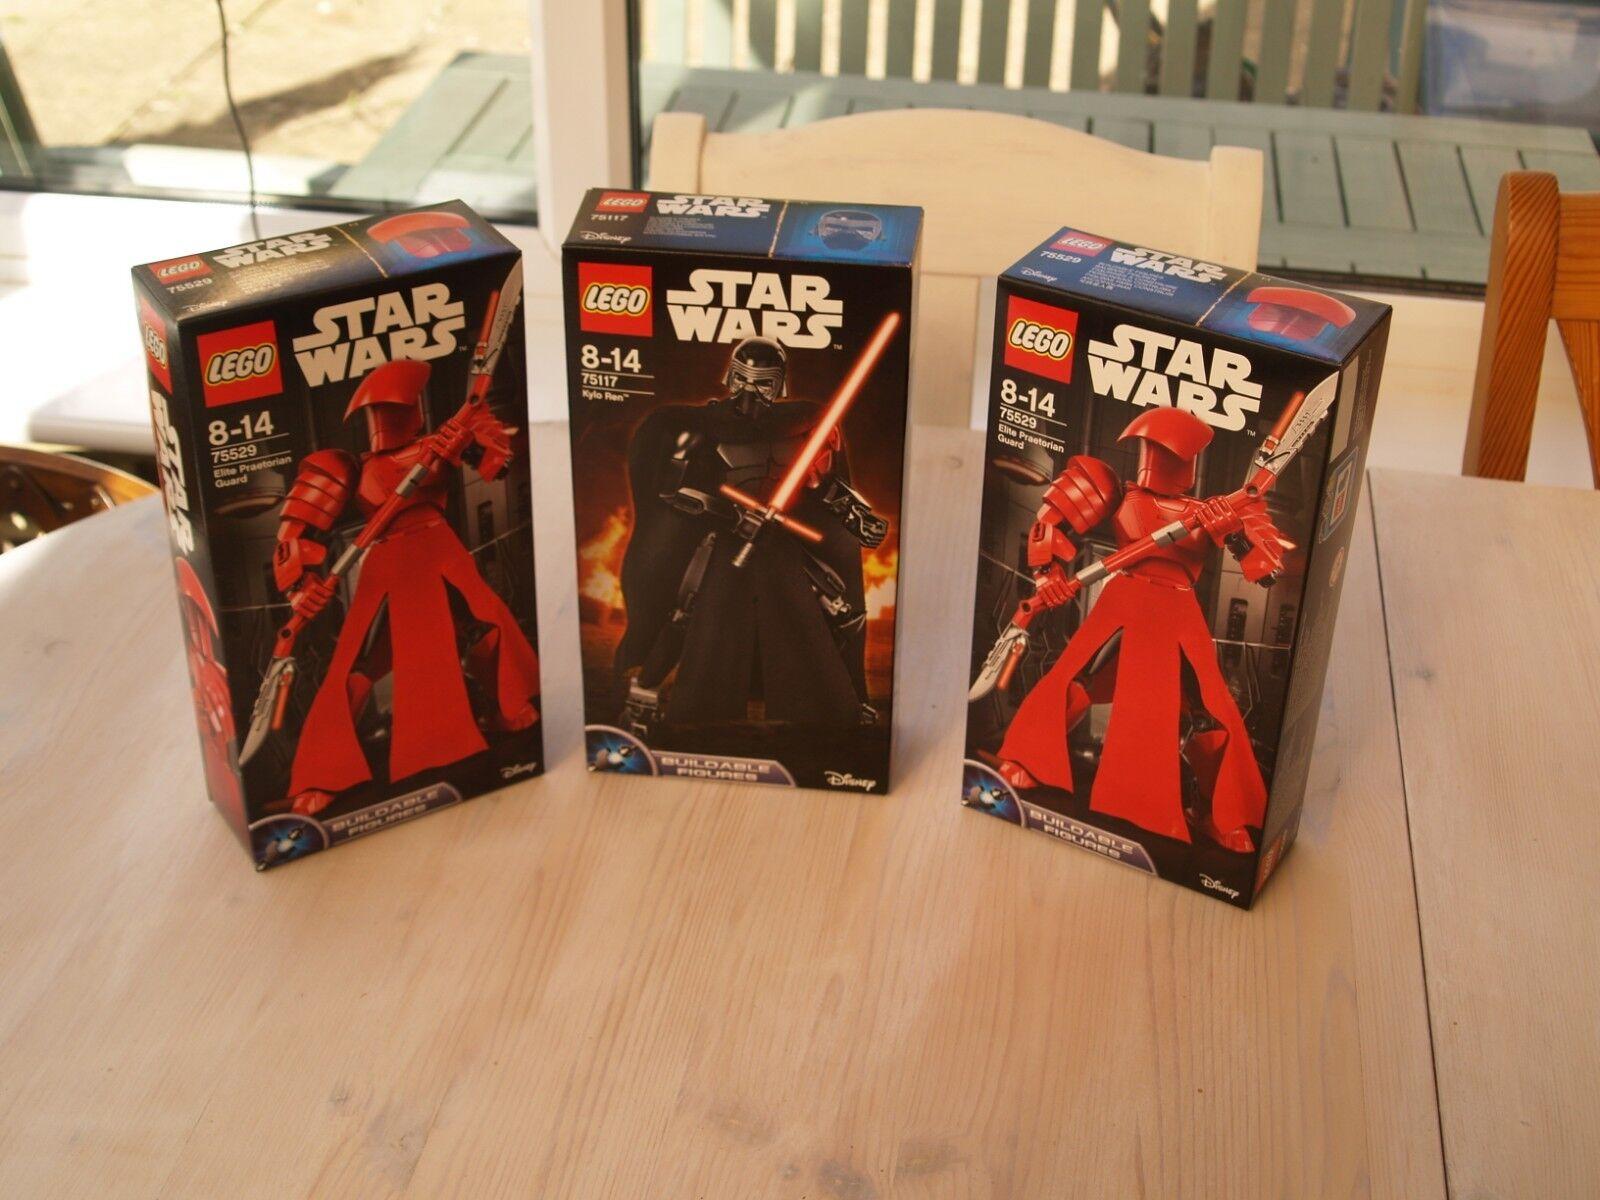 BNIB Lego Star Wars Buildable Figures Praetorian Guards X2 + Kylo Ren